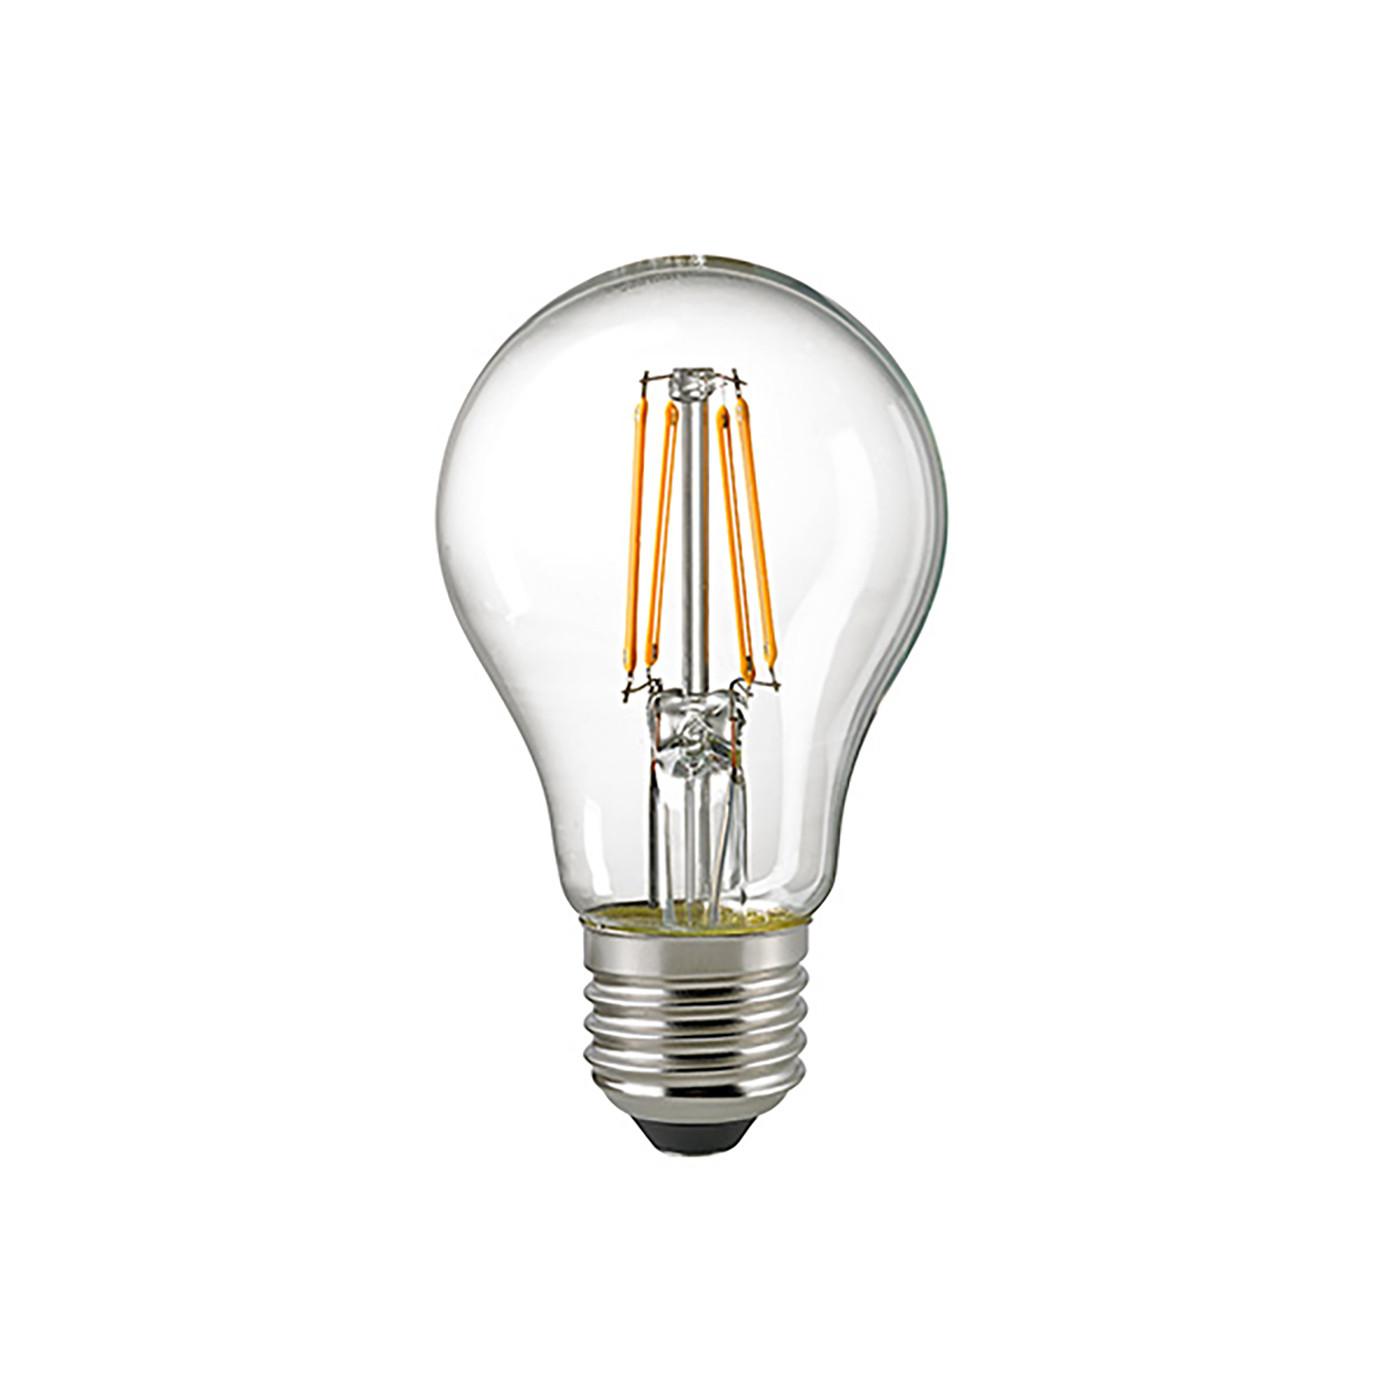 Sigor LED-Filament-Standardlampe A60 7W 2700K 230V E27 klar